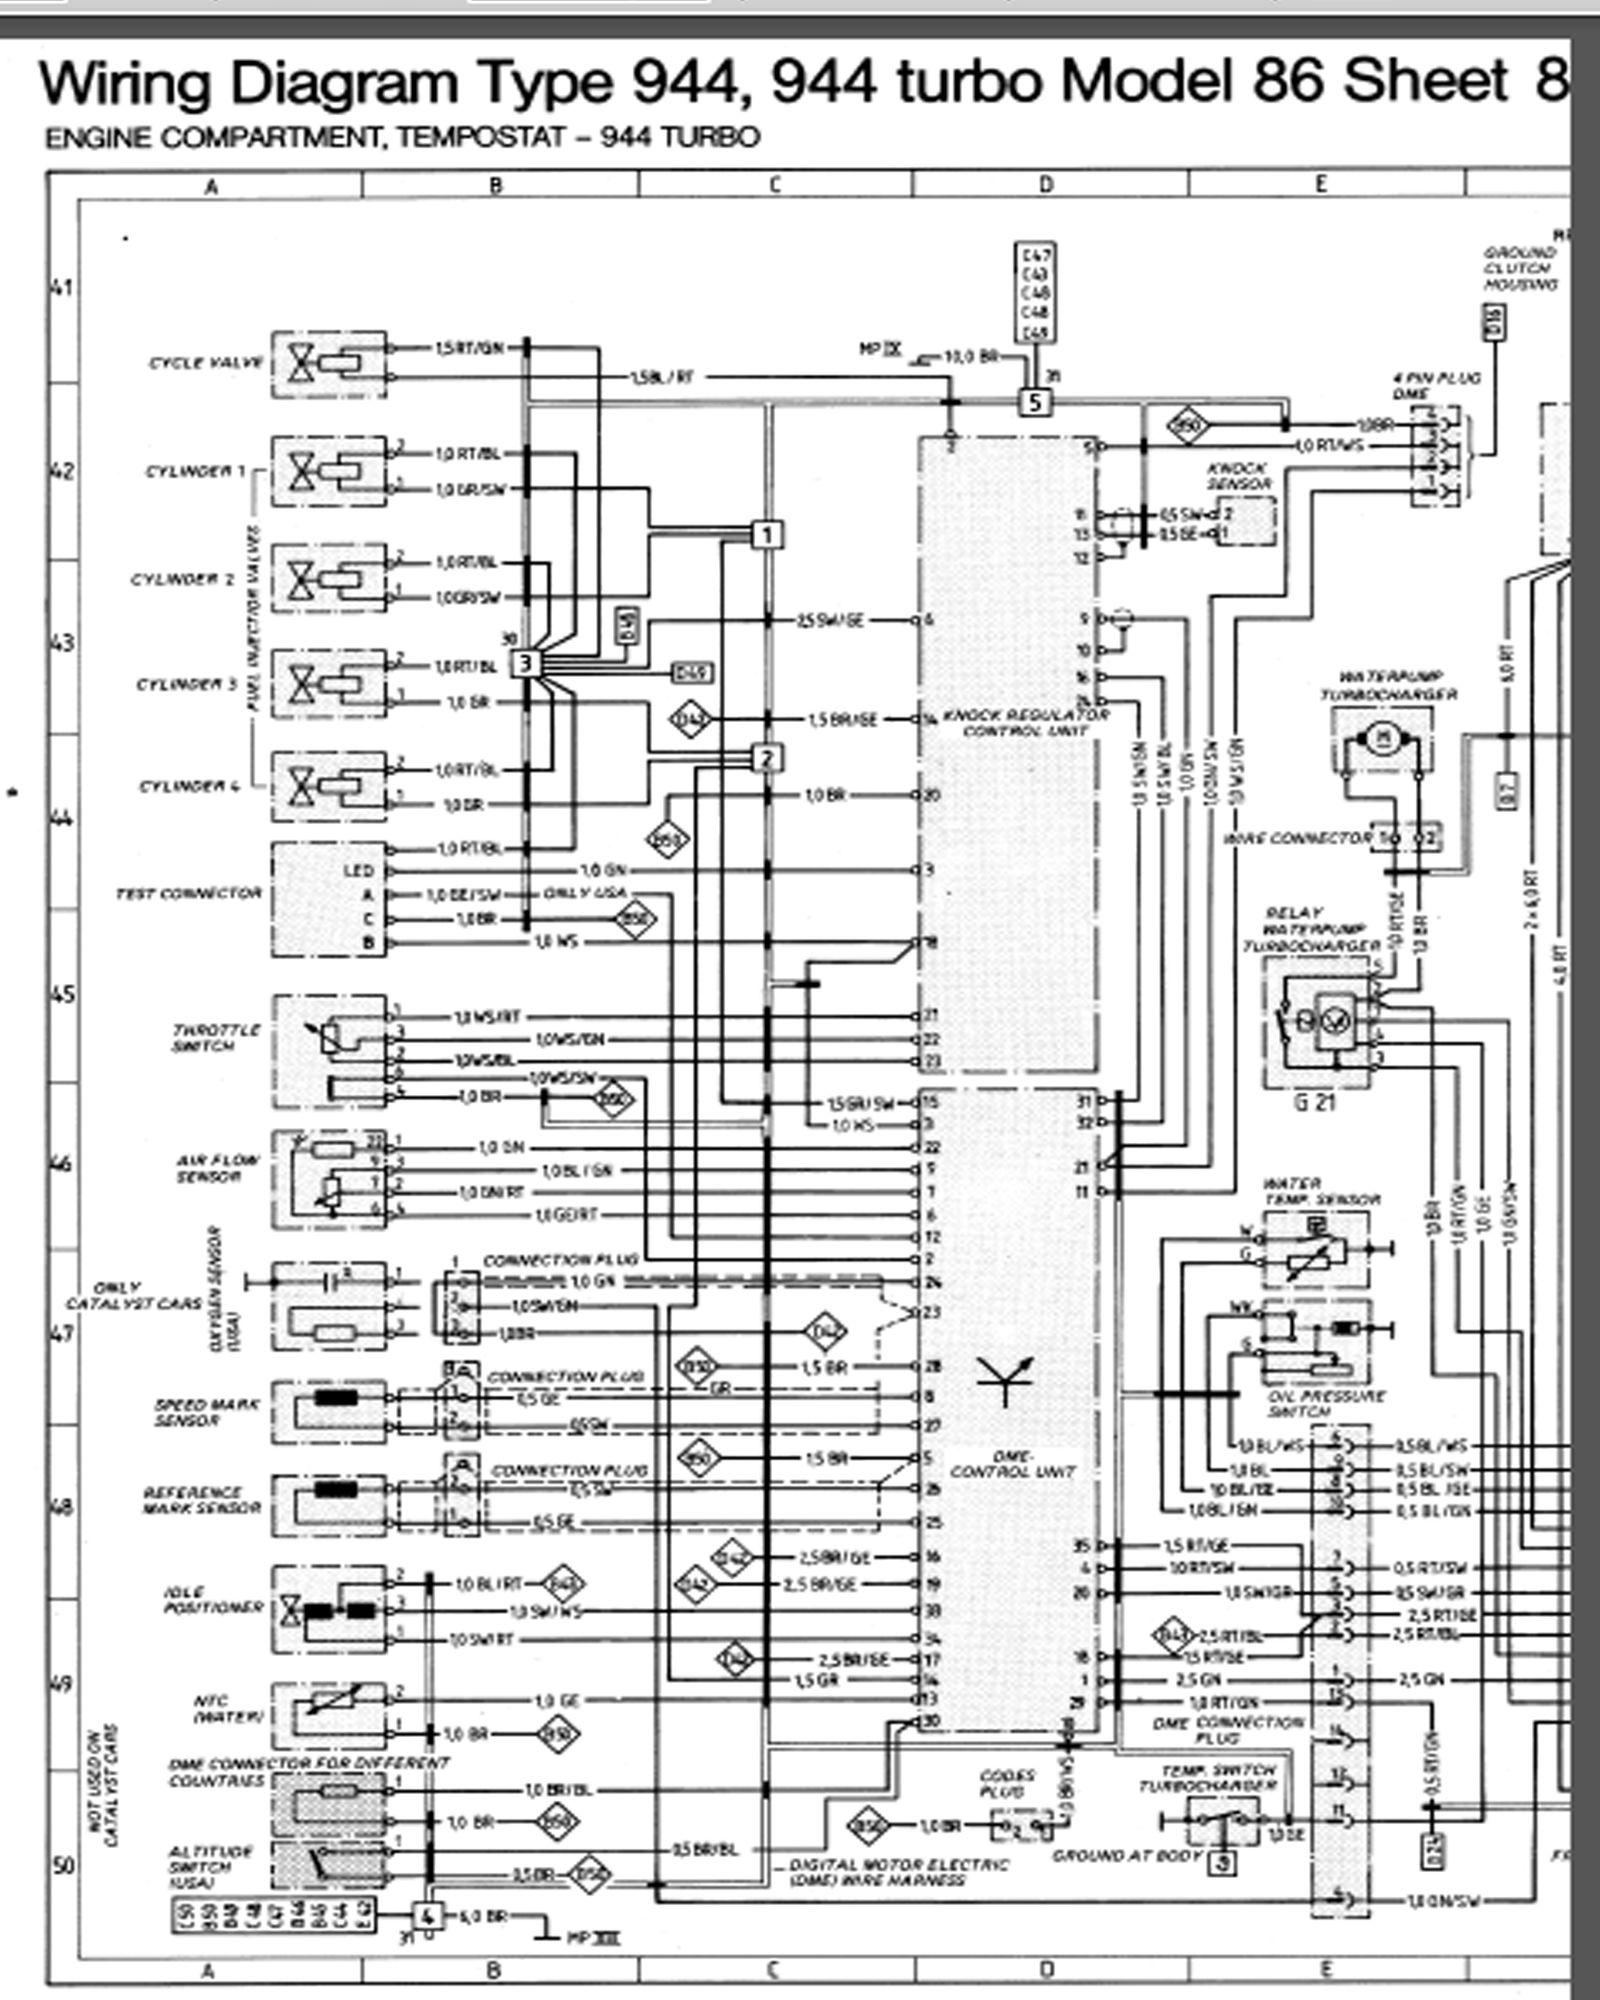 85 Porsche 944 Wiring Diagram - Wiring Diagrams Home on